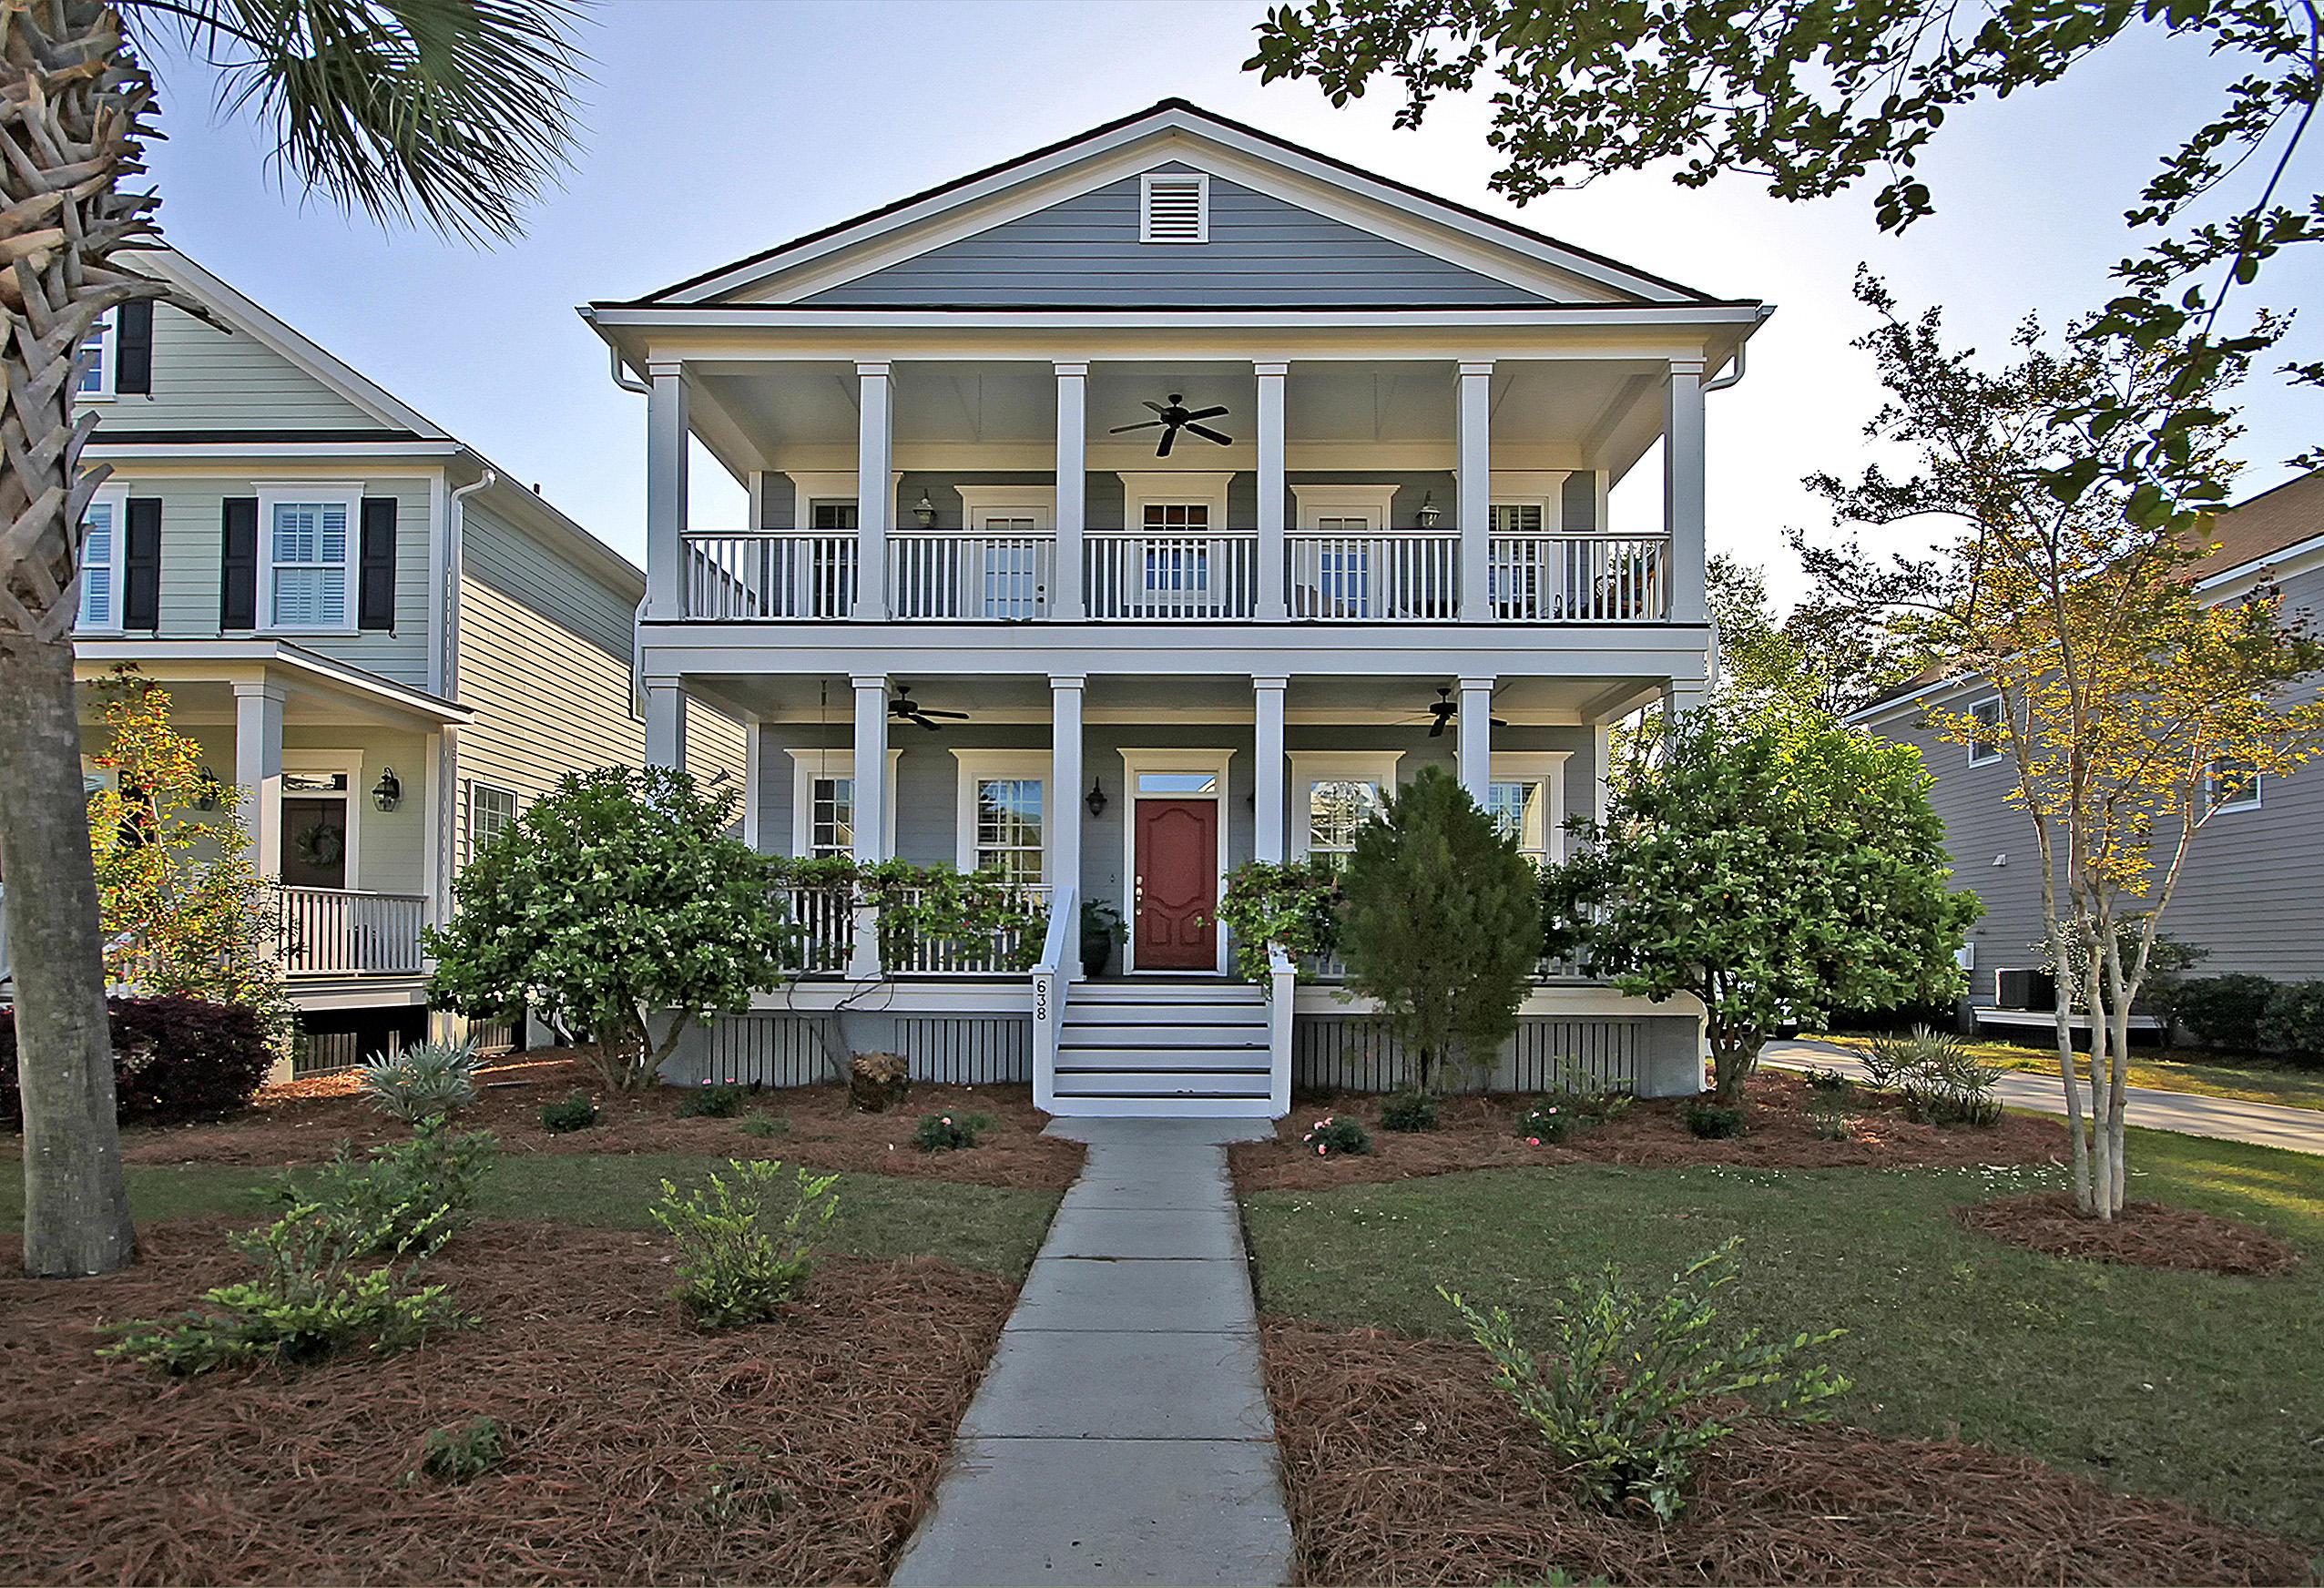 Cloudbreak Court Homes For Sale - 638 Cloudbreak, Charleston, SC - 37